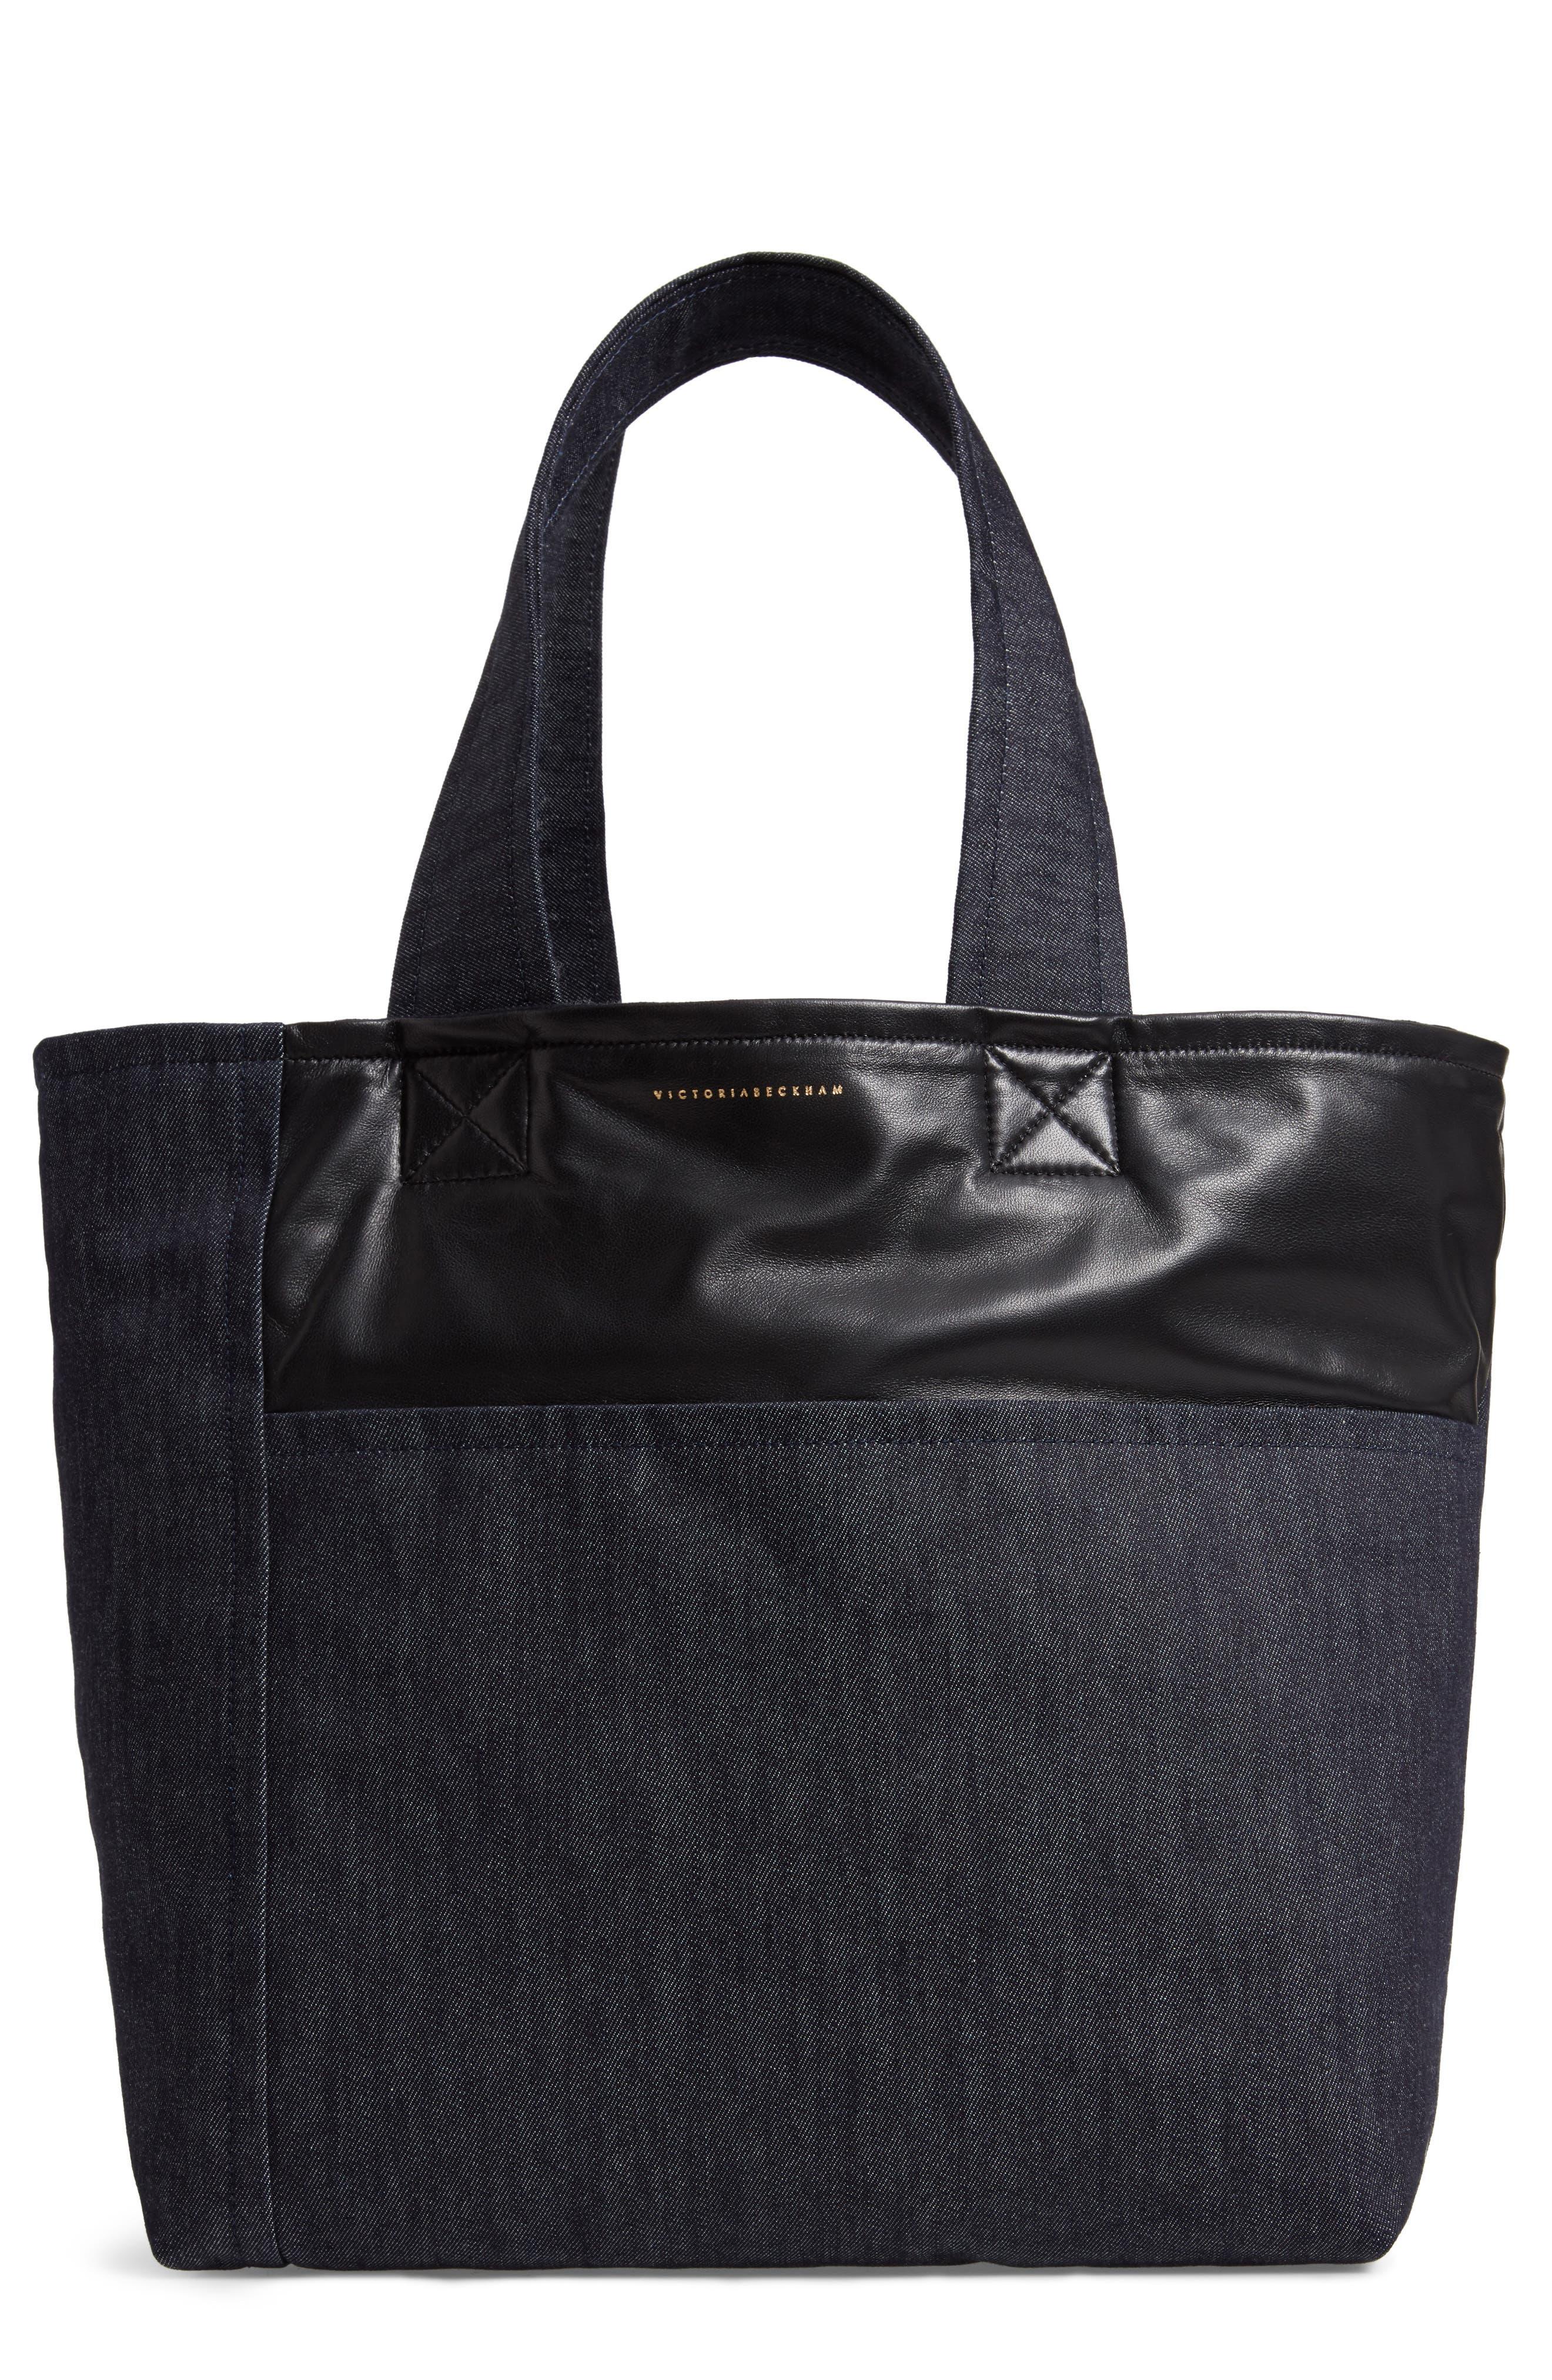 VICTORIA BECKHAM Sunday Denim & Leather Tote Bag, Main, color, 400